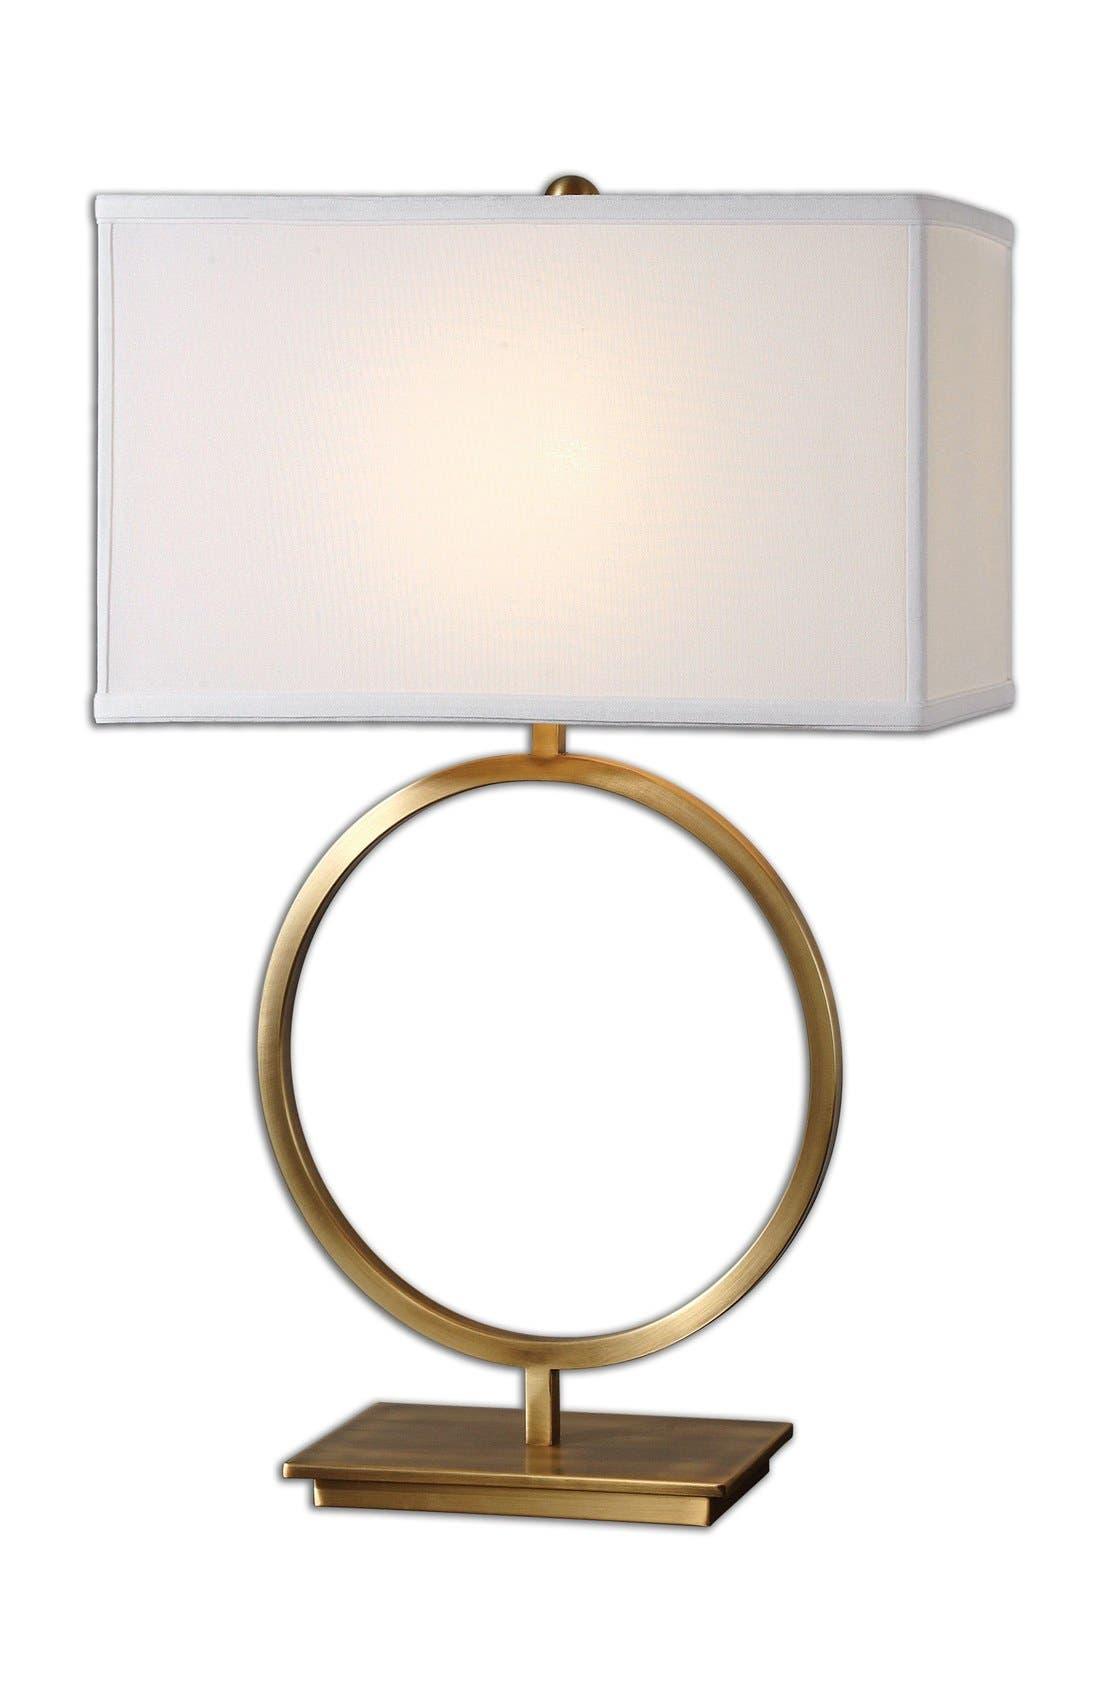 Alternate Image 1 Selected - Uttermost 'Duara' Circle Table Lamp